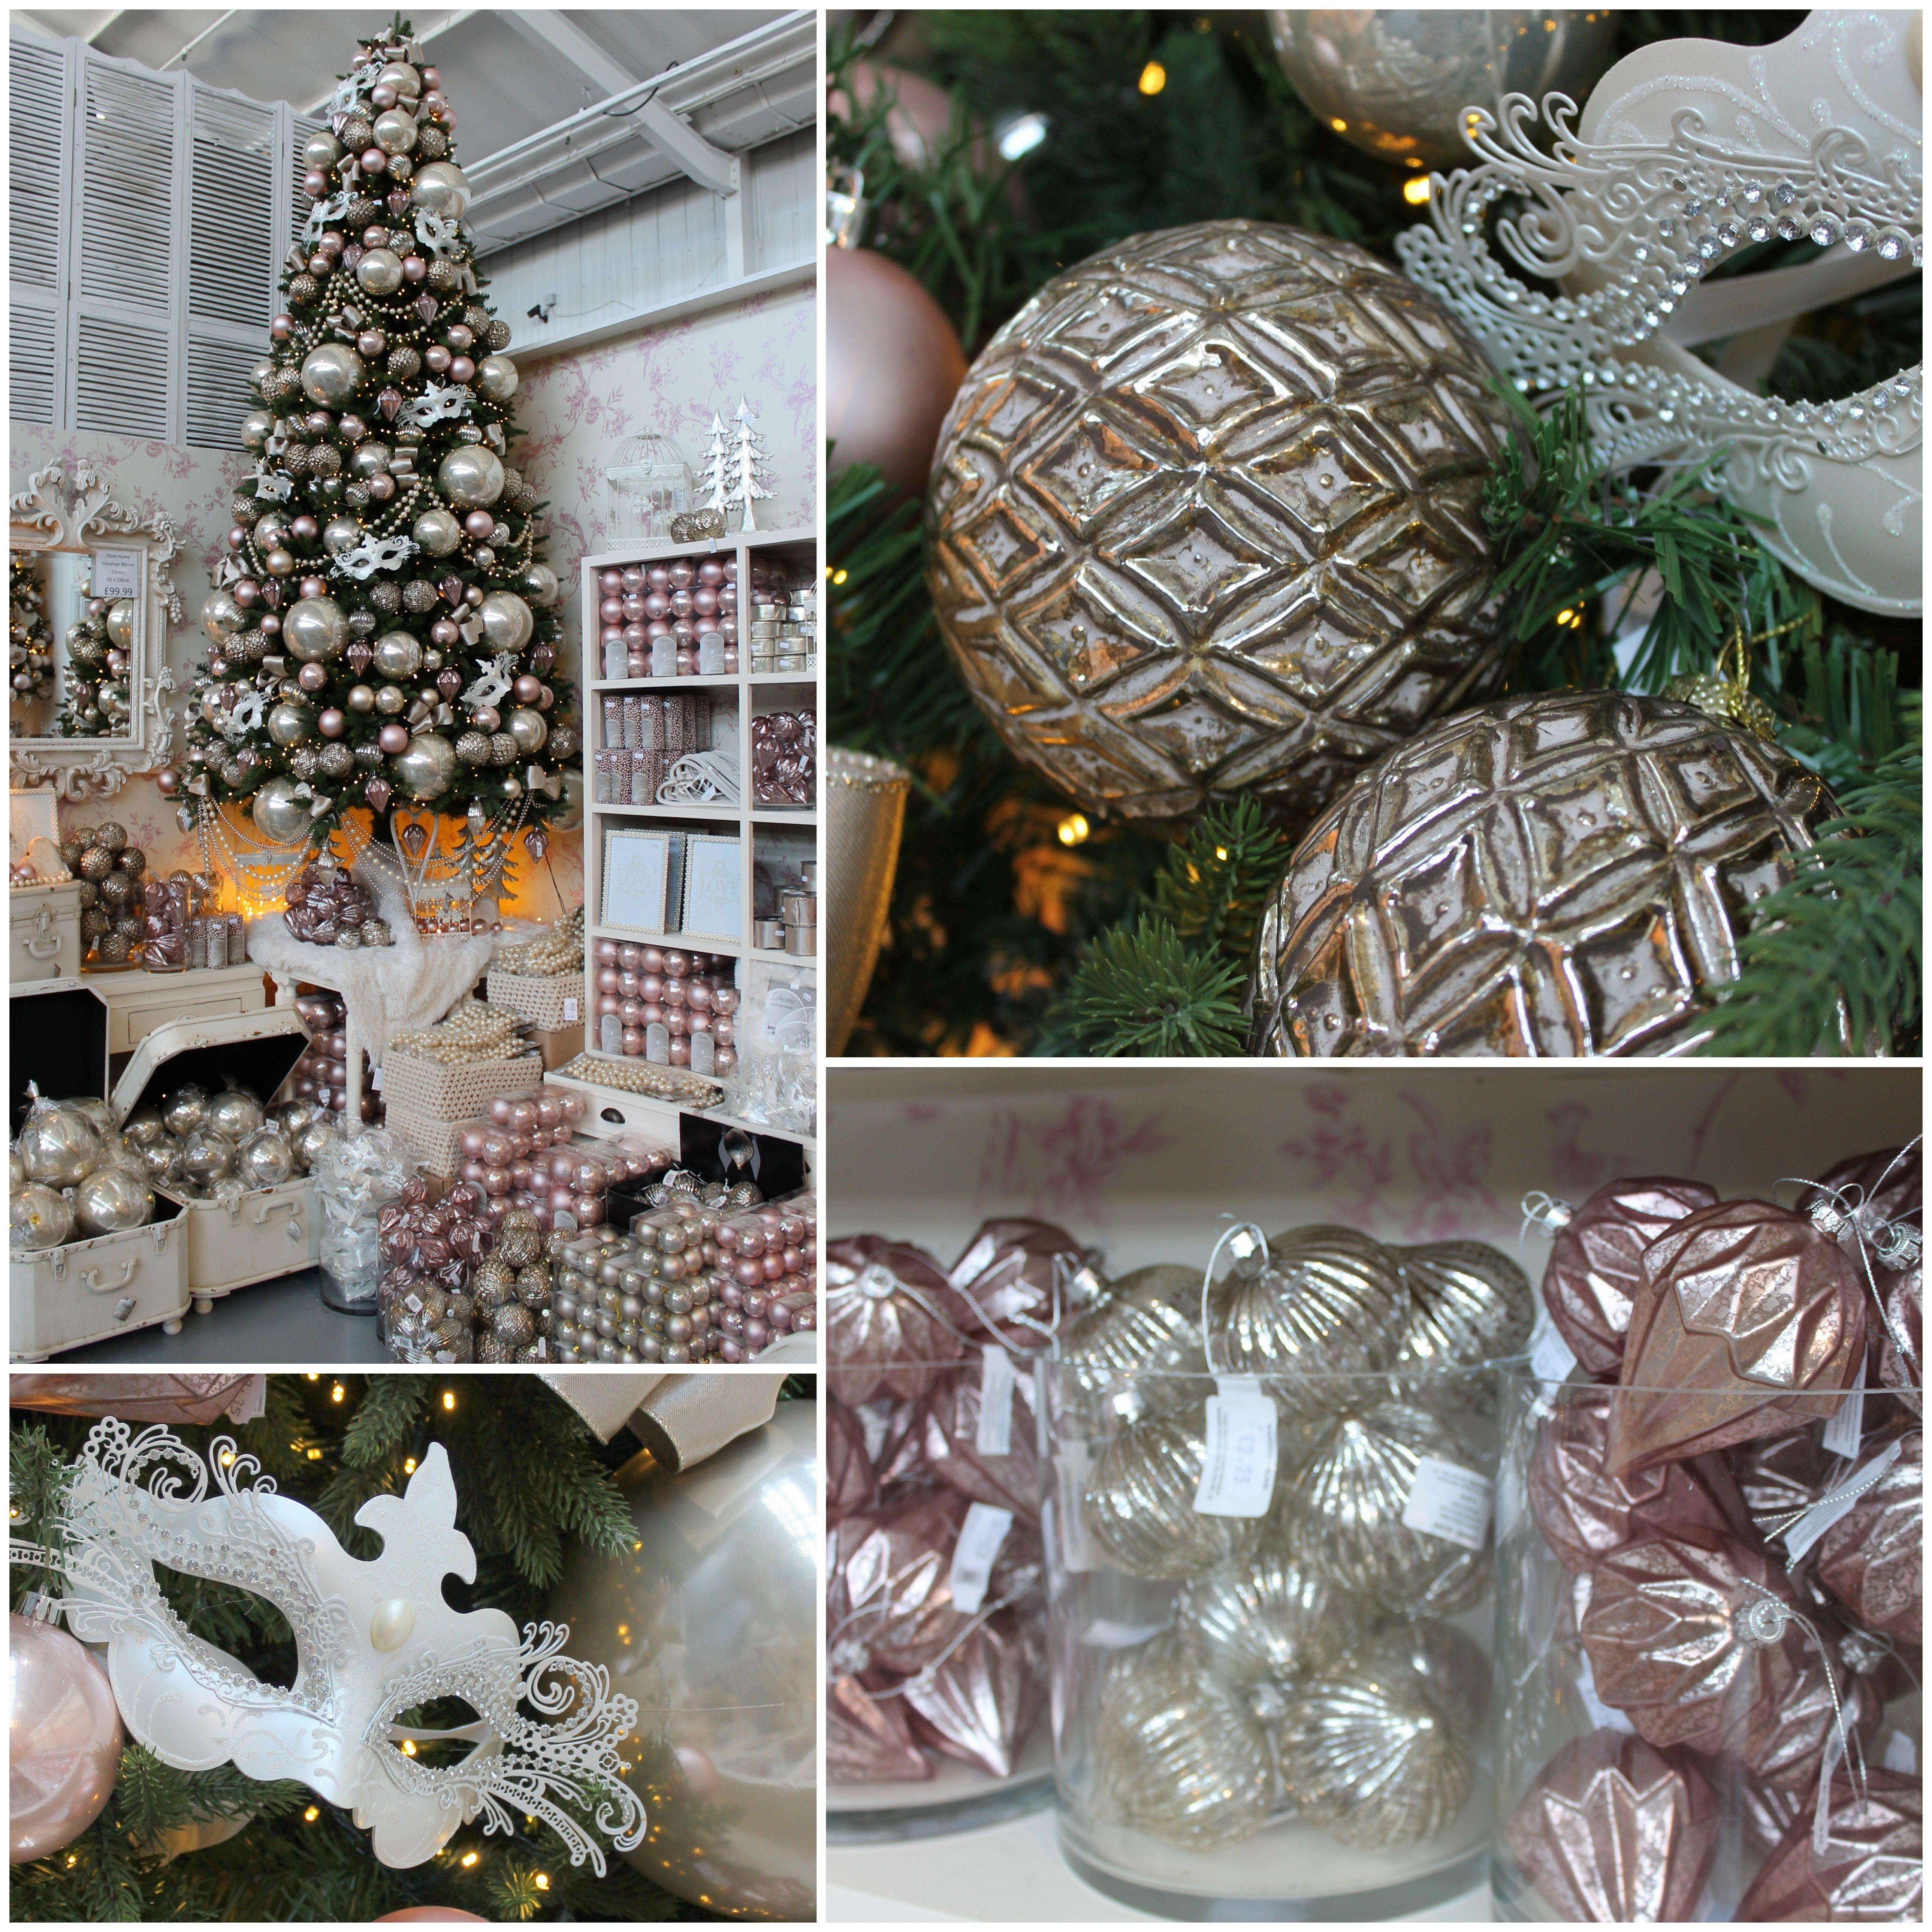 Fairytale Christmas Decorations.Romantica A Fairytale Christmas Scheme In Blush Pink Pearl